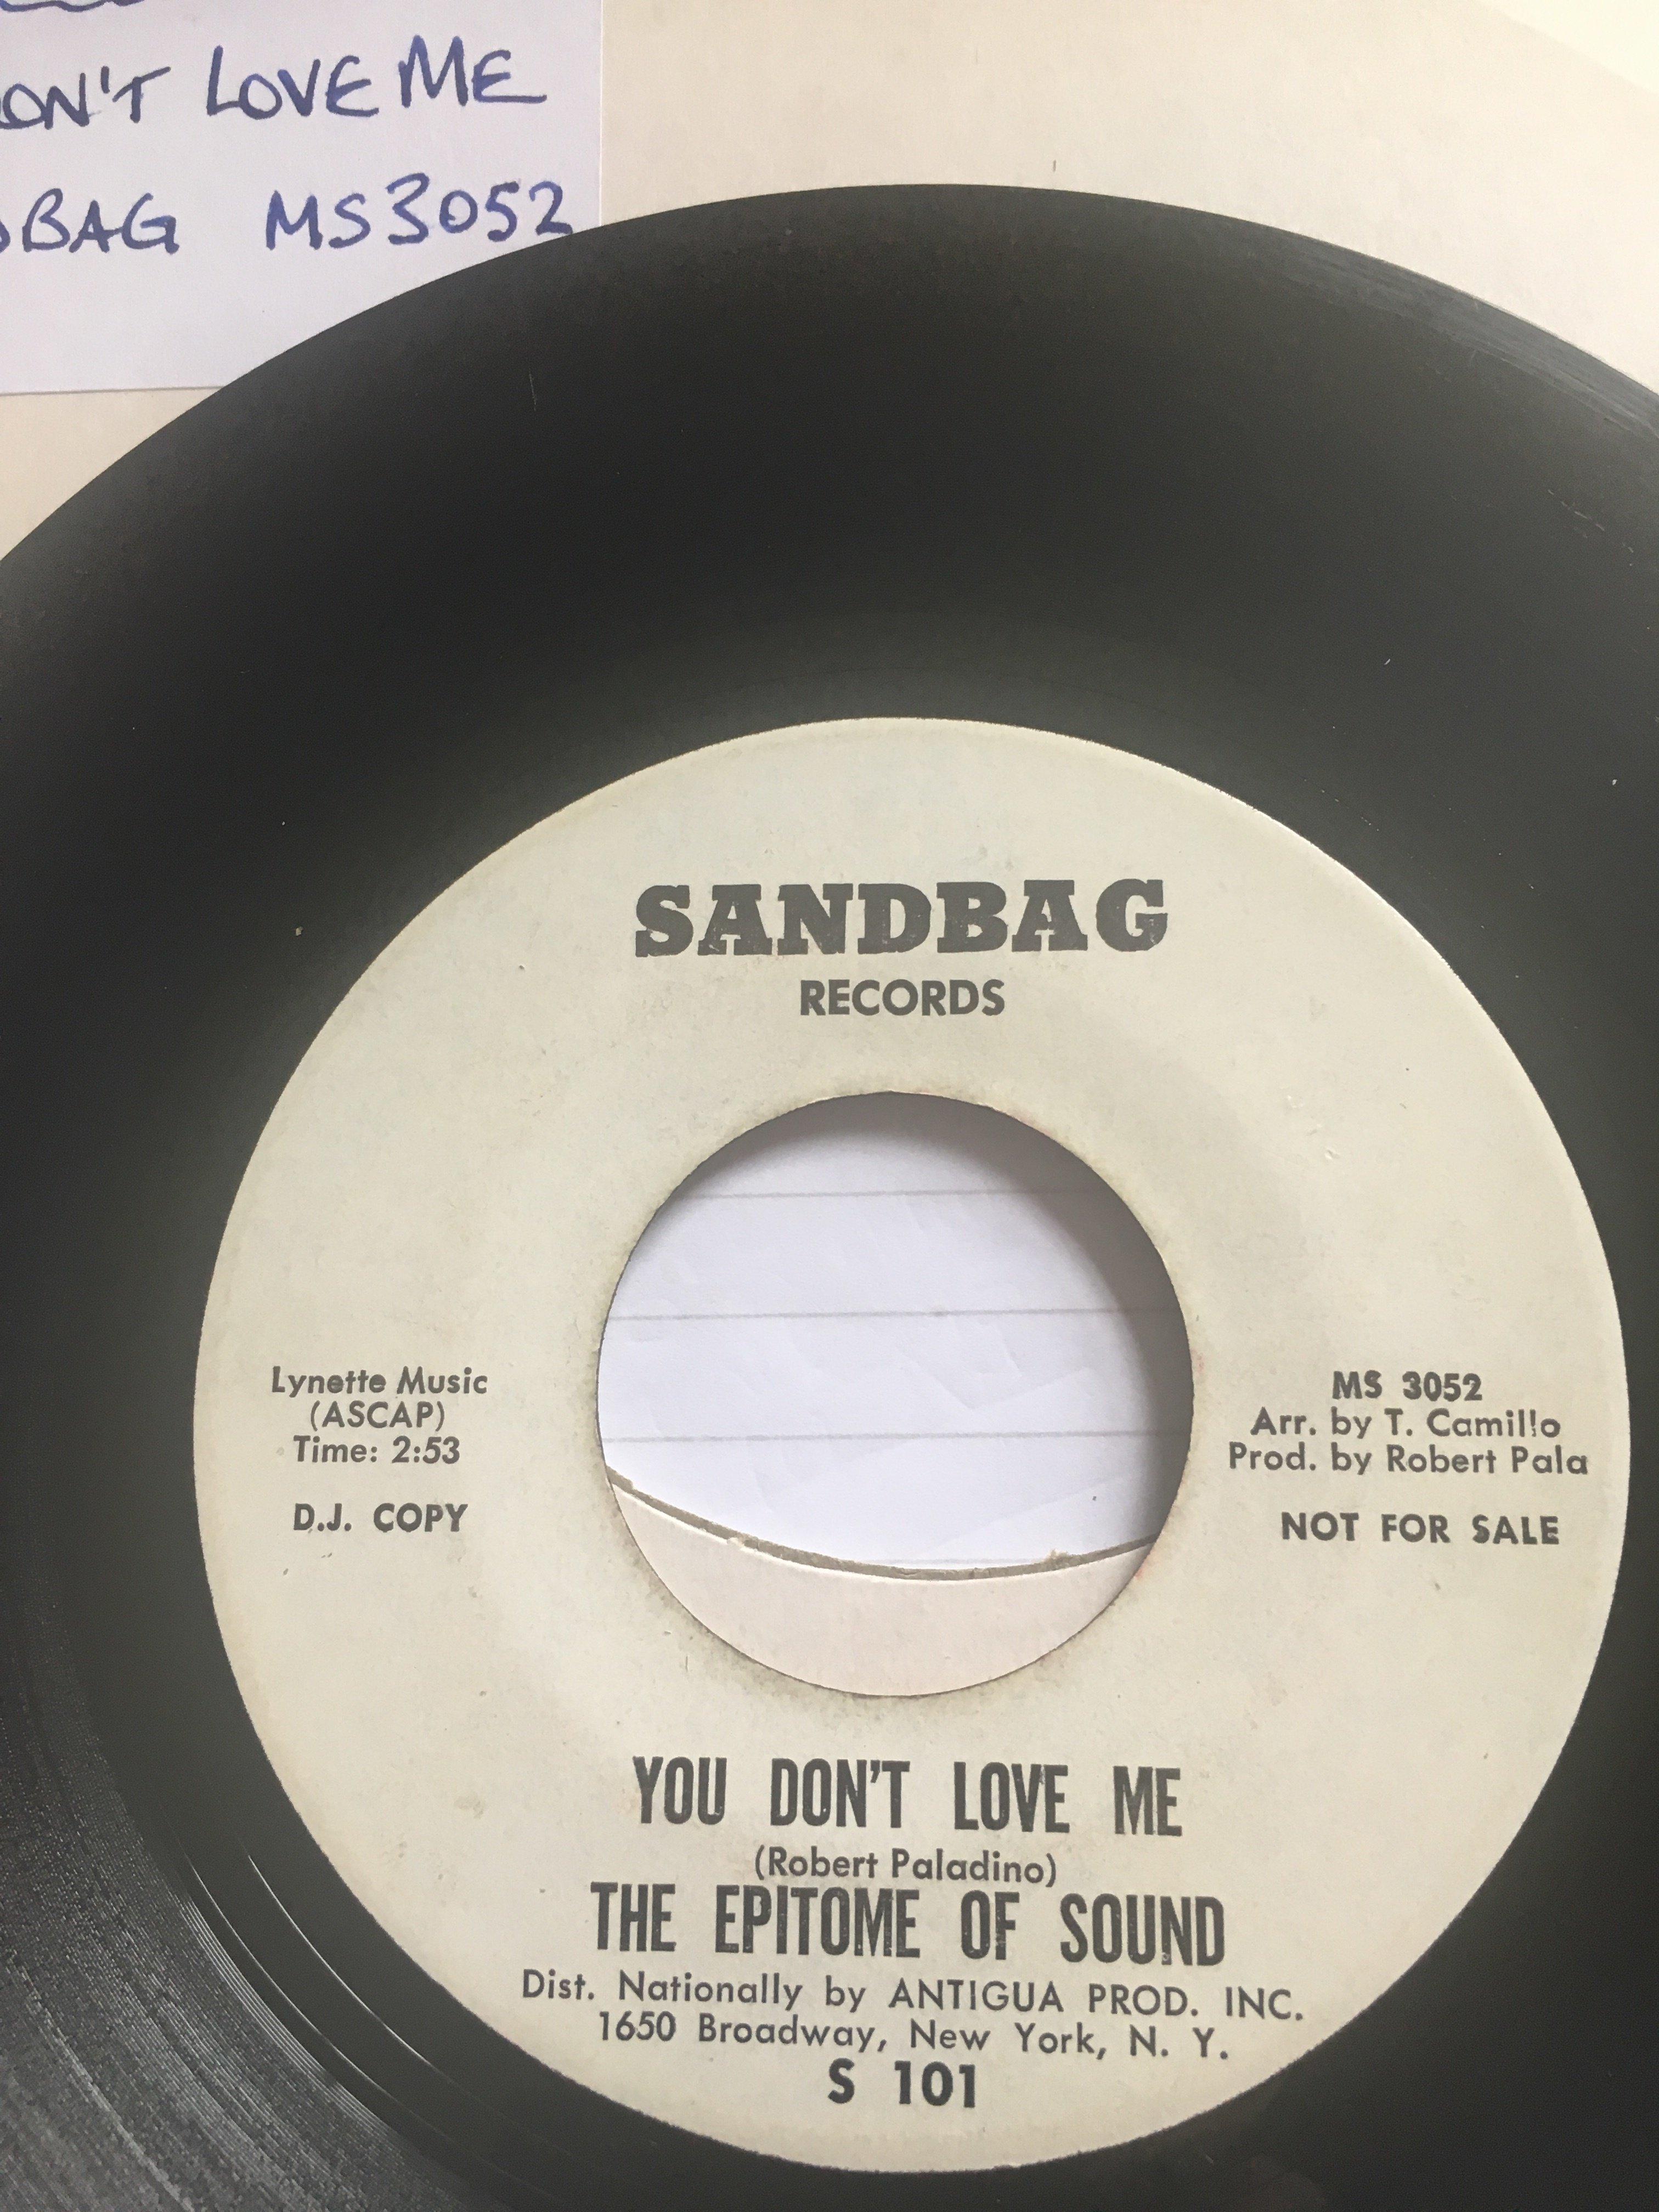 Epitome Of Sound Rare Original Demo Record Sales